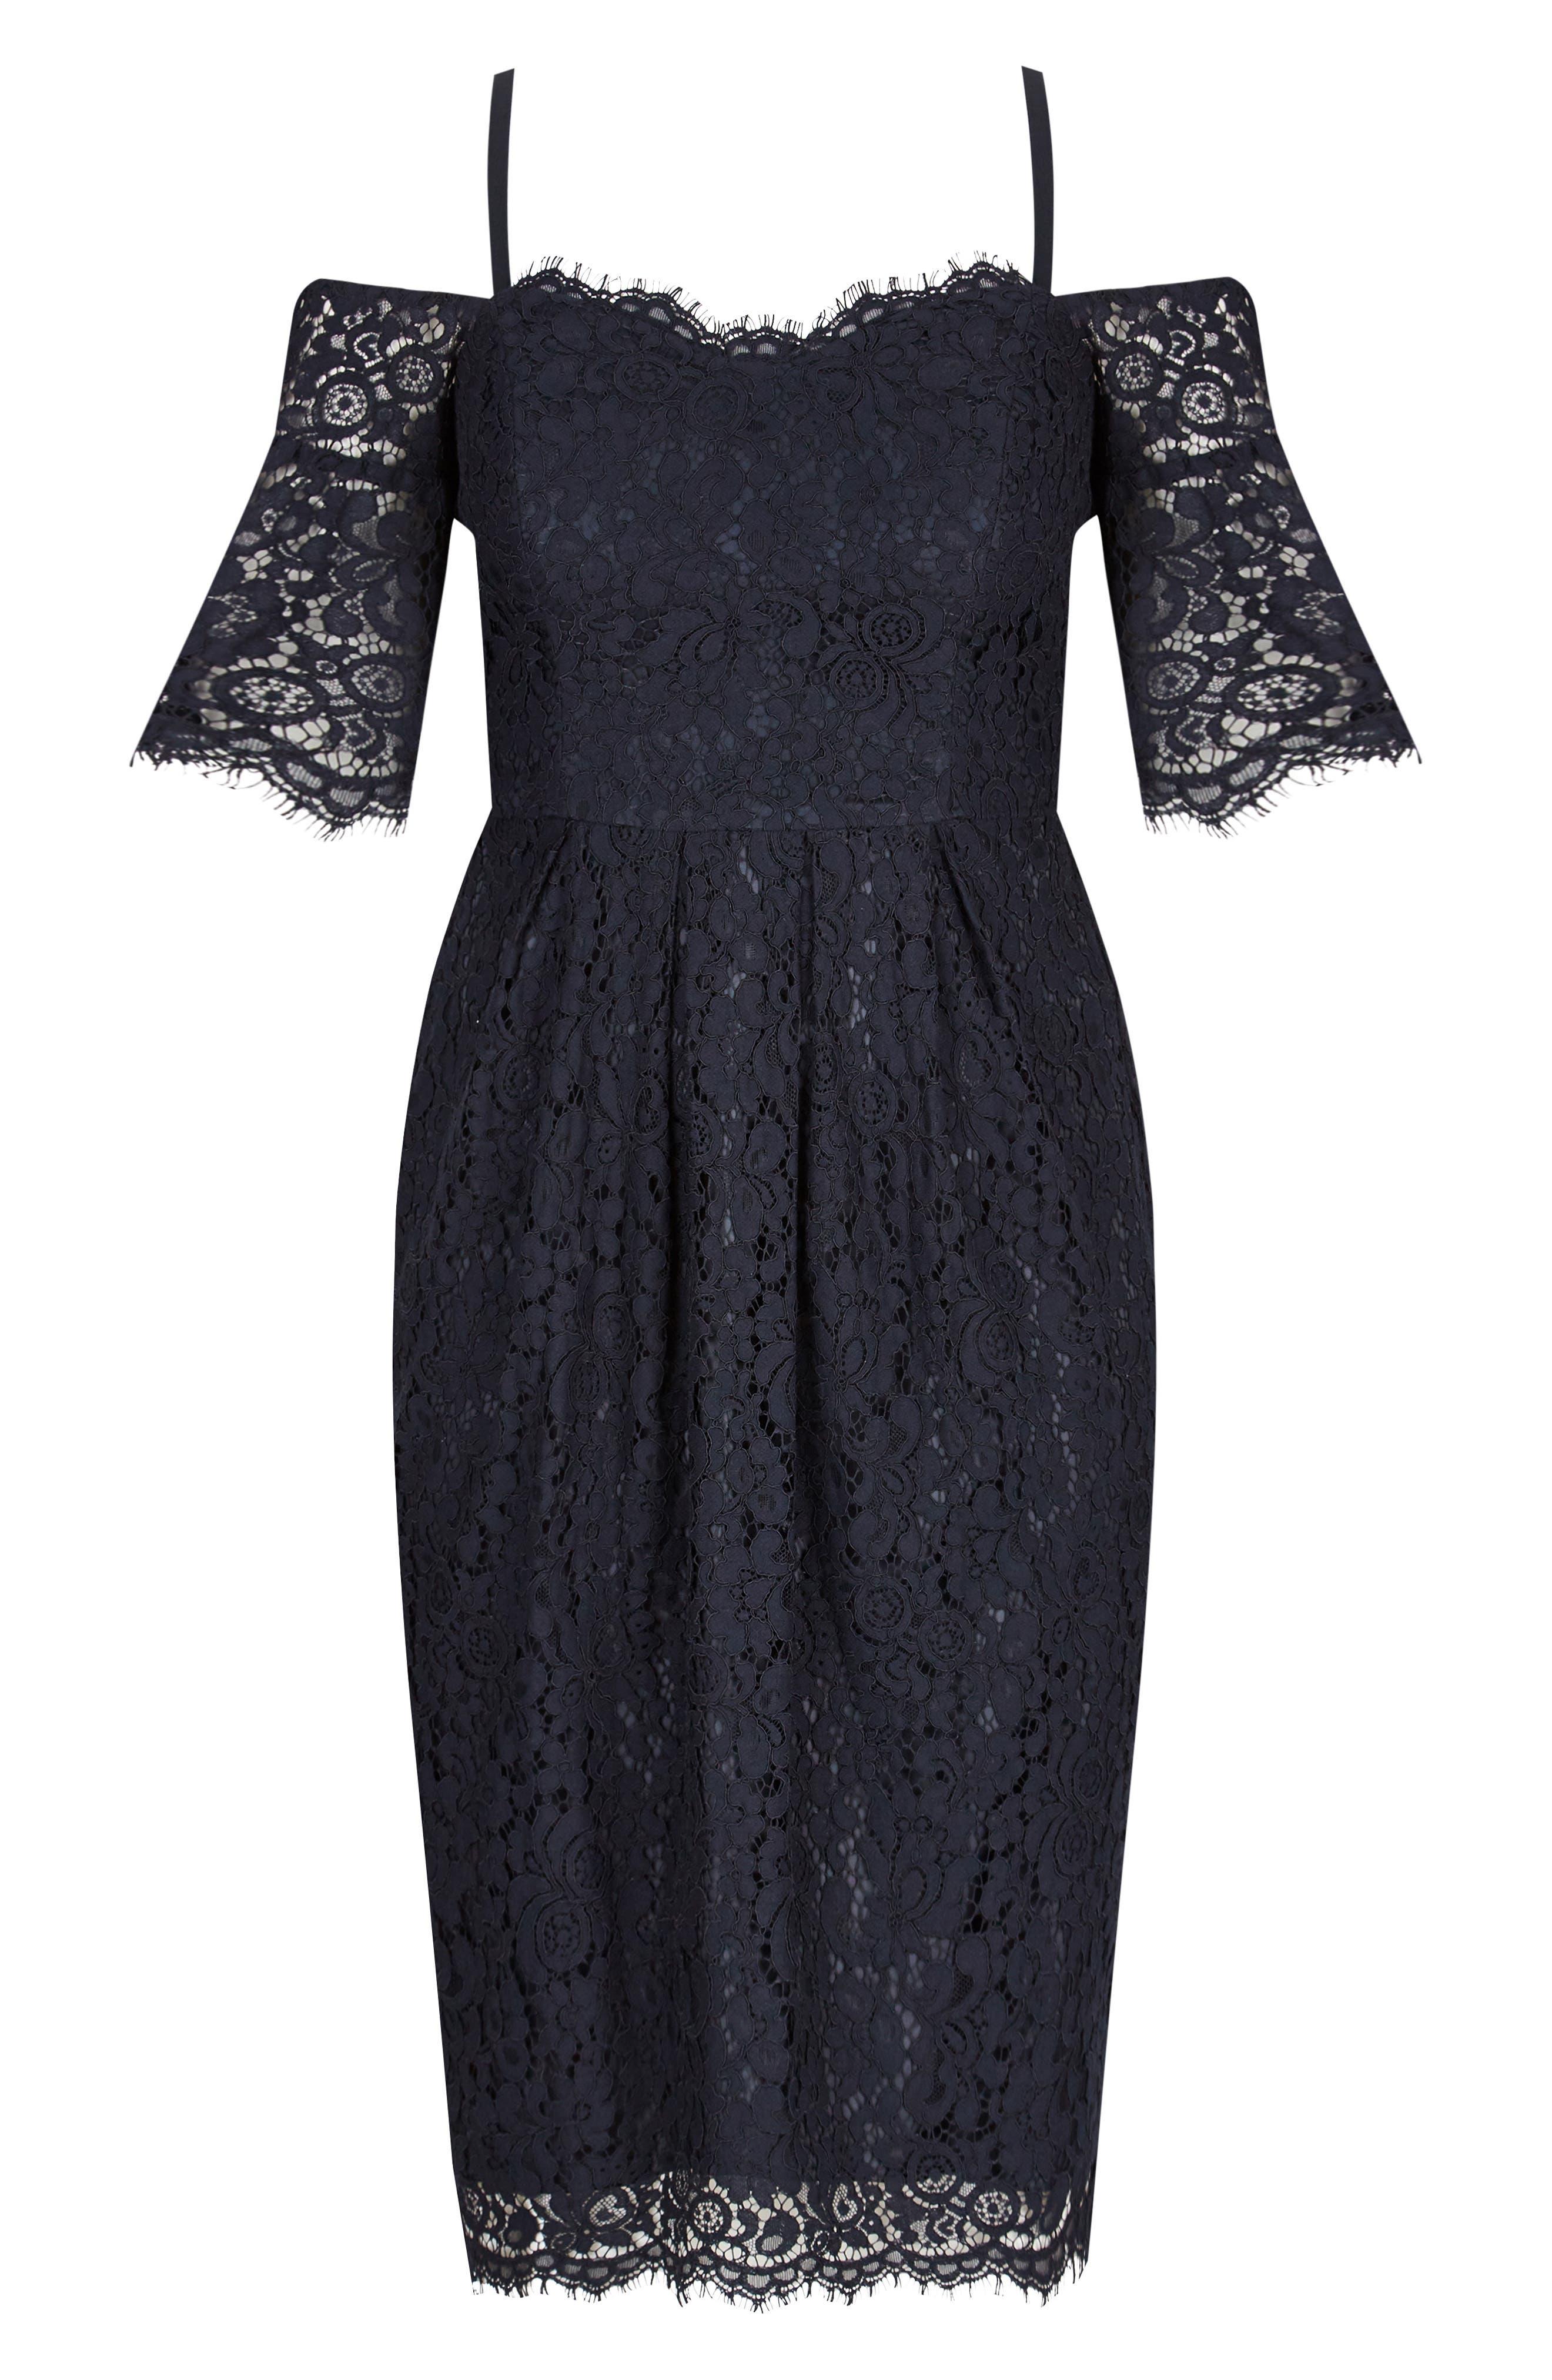 CITY CHIC, Amour Cold Shoulder Lace Sheath Dress, Alternate thumbnail 3, color, NAVY